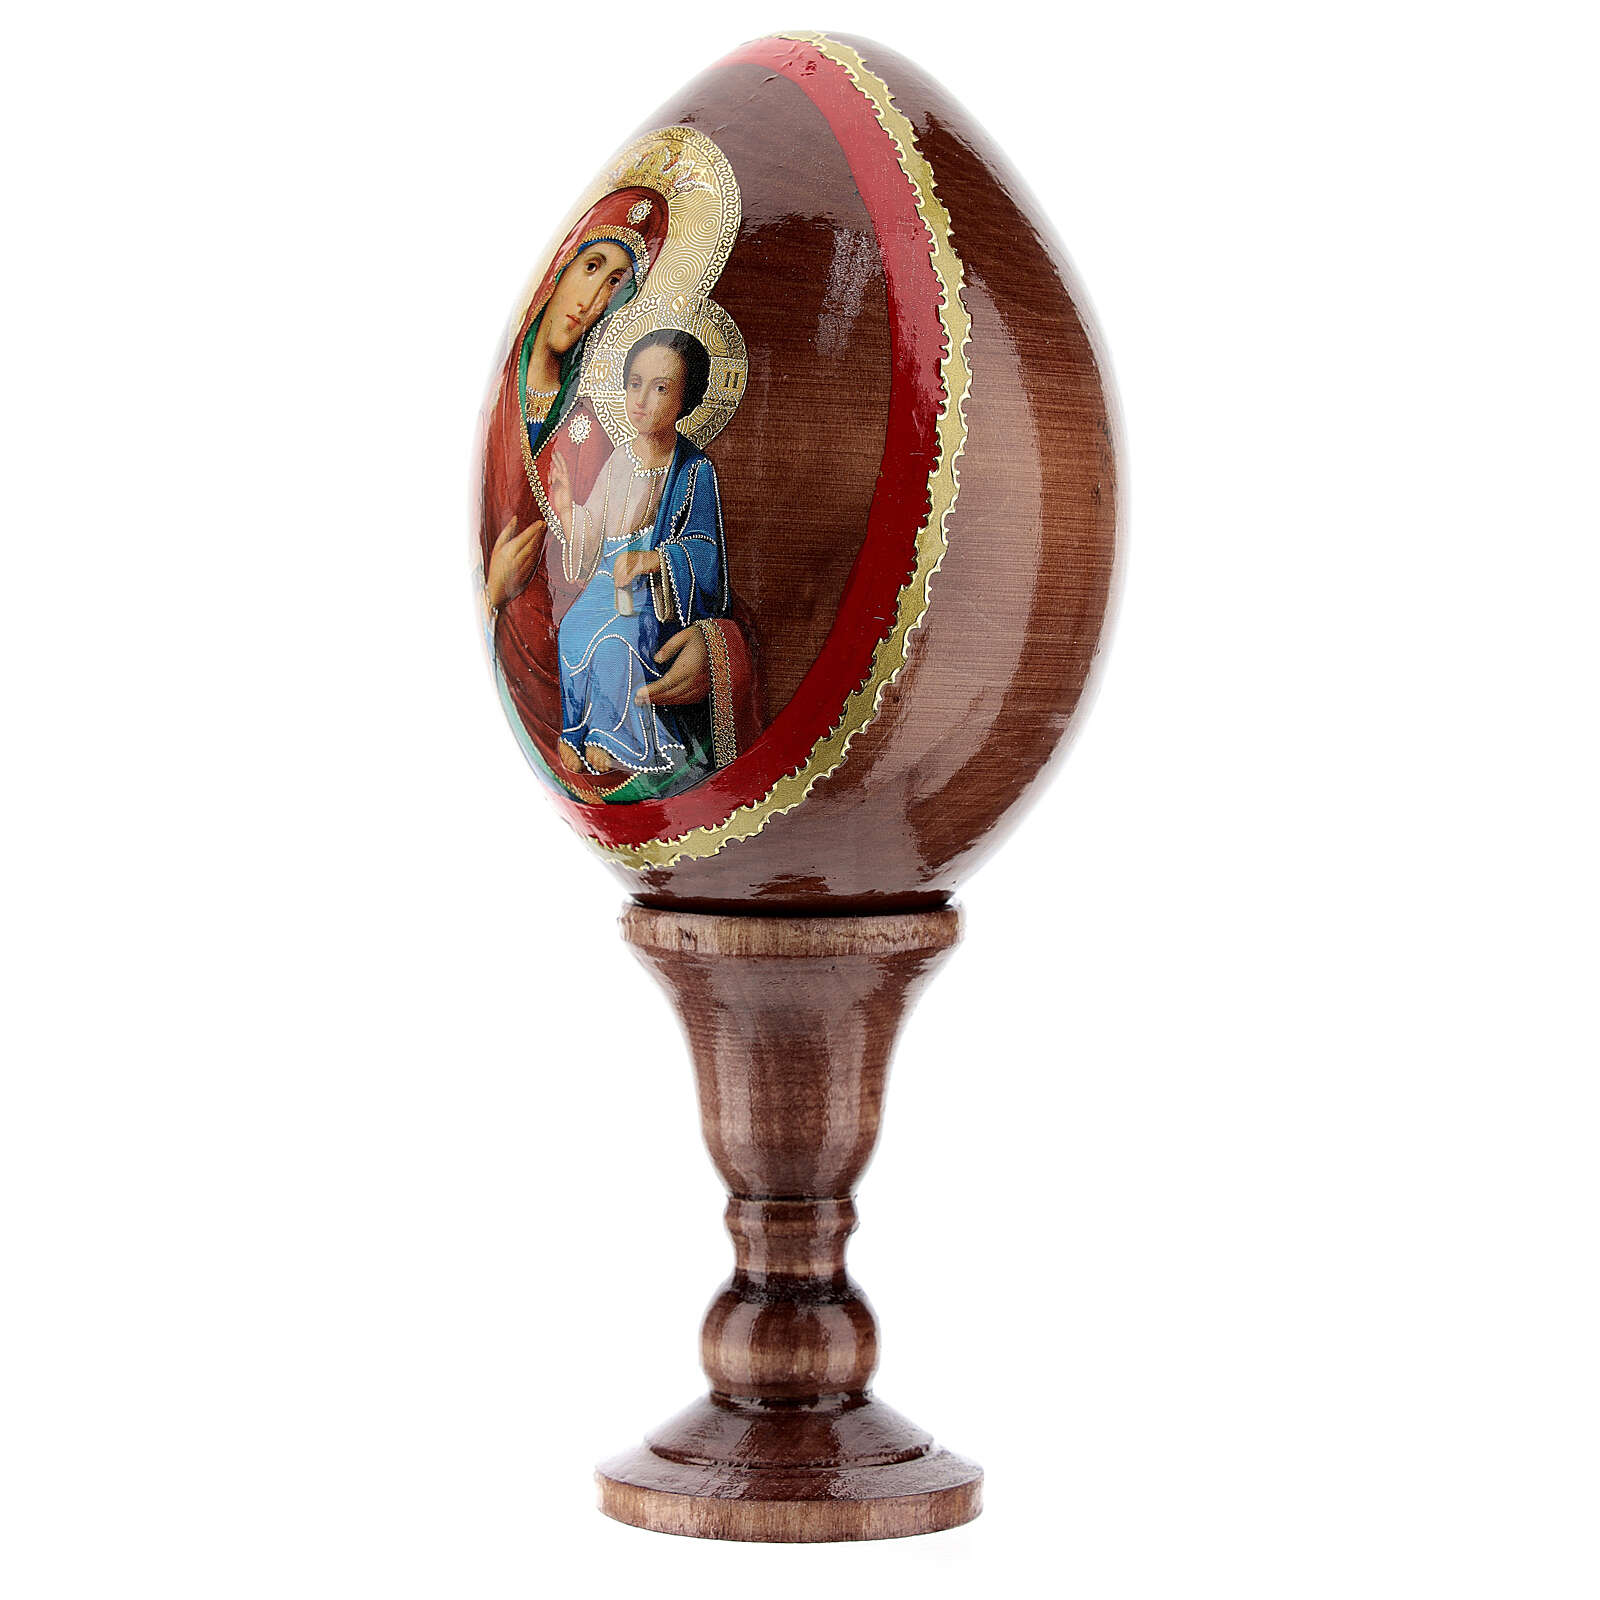 Uovo legno icona russa Iverskaya h. tot 13 cm 4